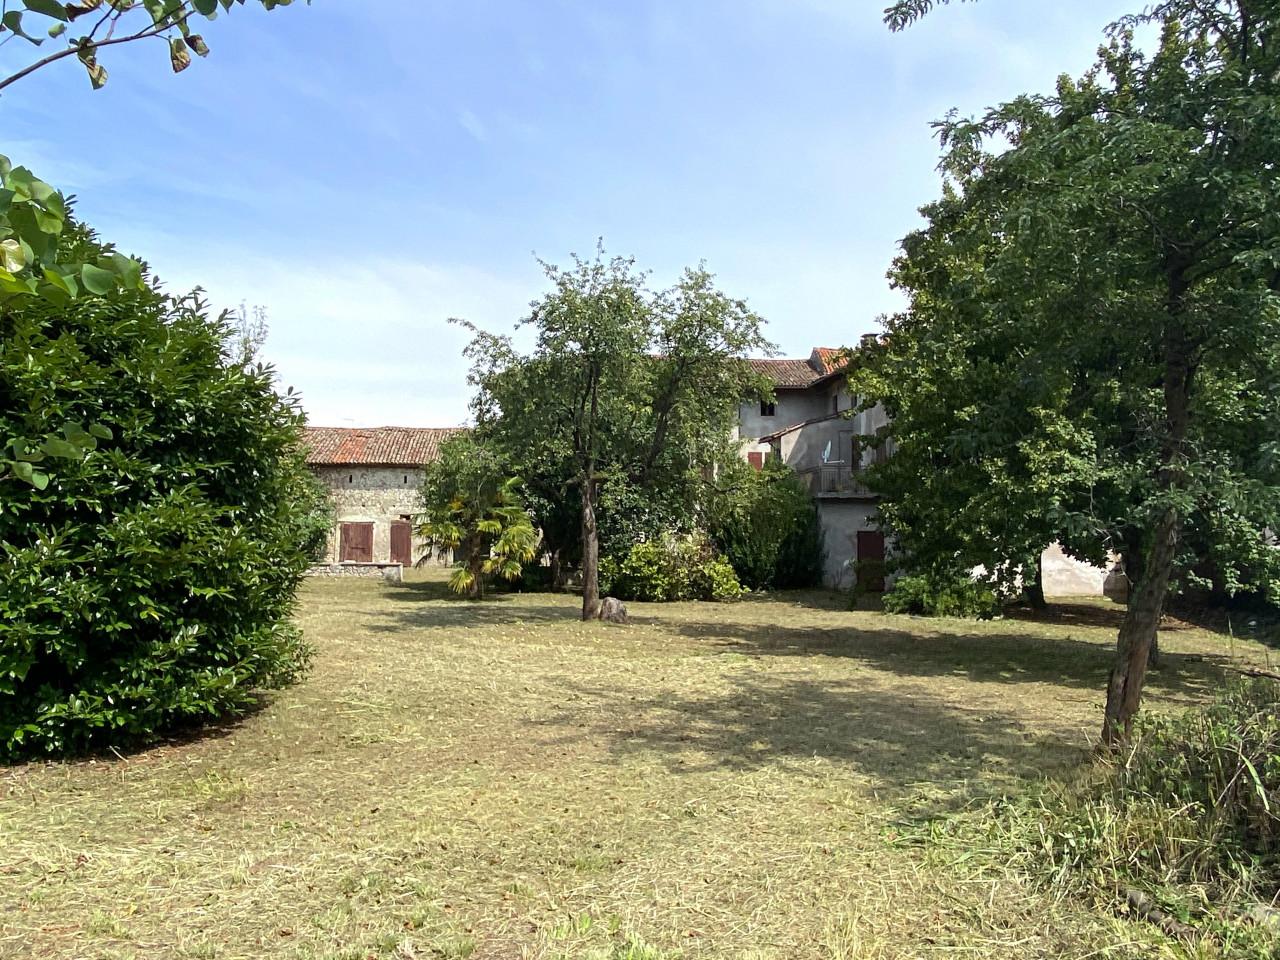 Dimora Storica in vendita in Centro a Valvasone - Rif.P1 https://images.gestionaleimmobiliare.it/foto/annunci/200820/2282895/1280x1280/001__img_3448.jpg